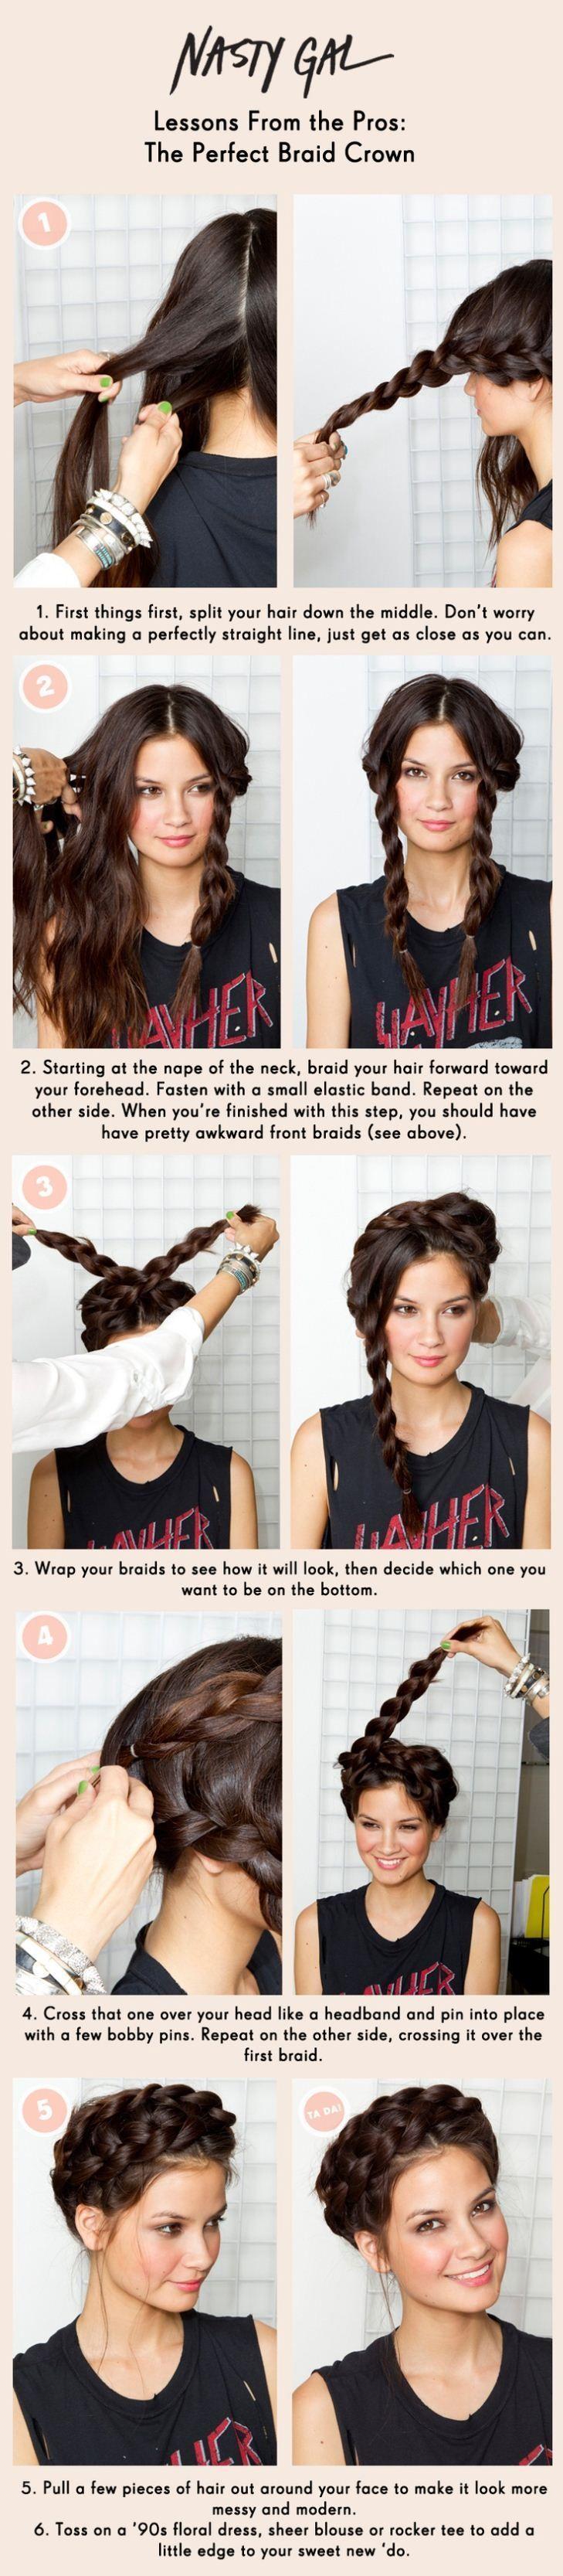 Peinados para cabello largo [FOTOS] | ActitudFEM